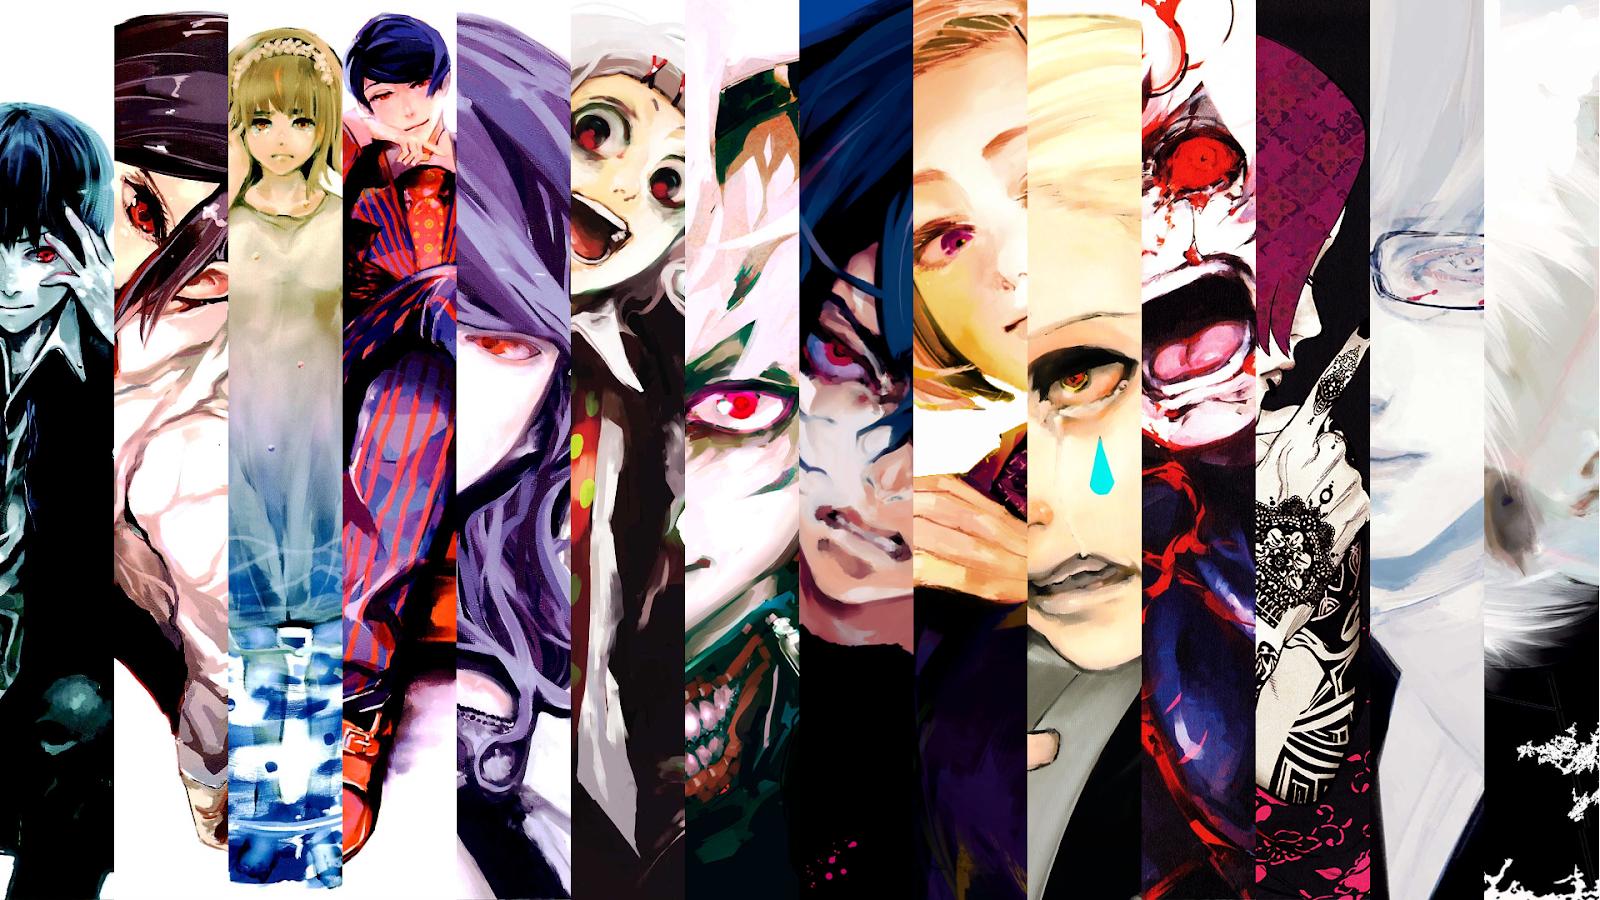 12 Situs Download Wallpaper Anime Android Sachi Wallpaper